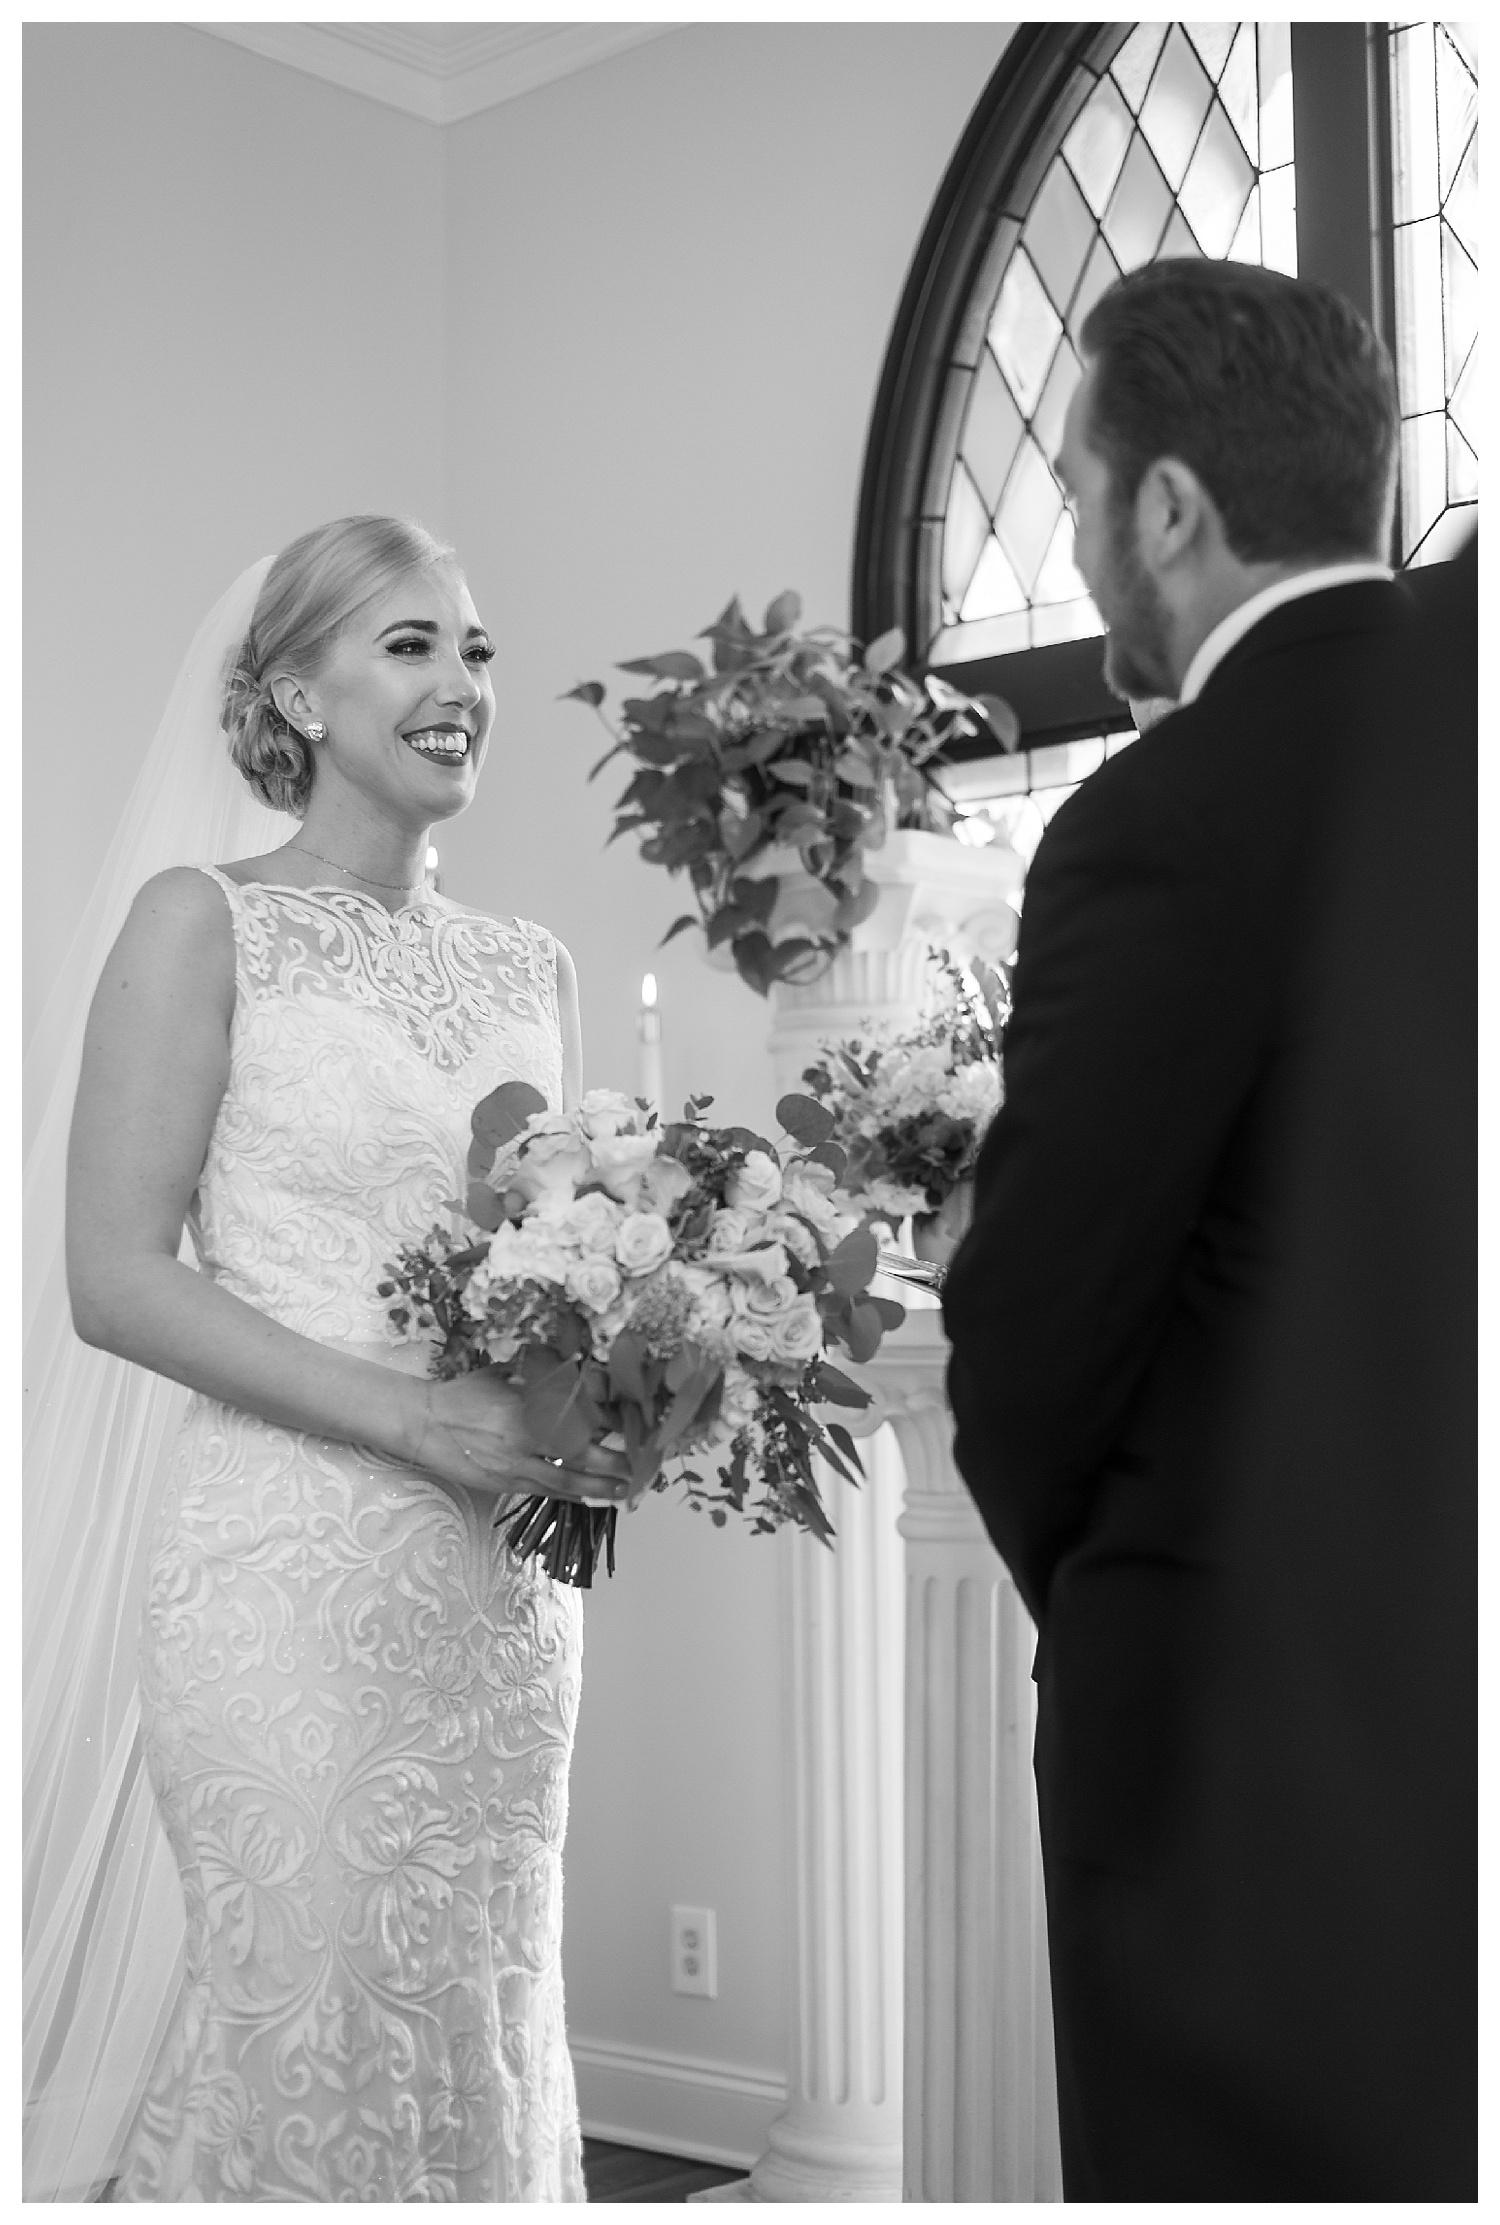 St. Augustine Wedding - Amore Wedding Chapel - 035.JPG